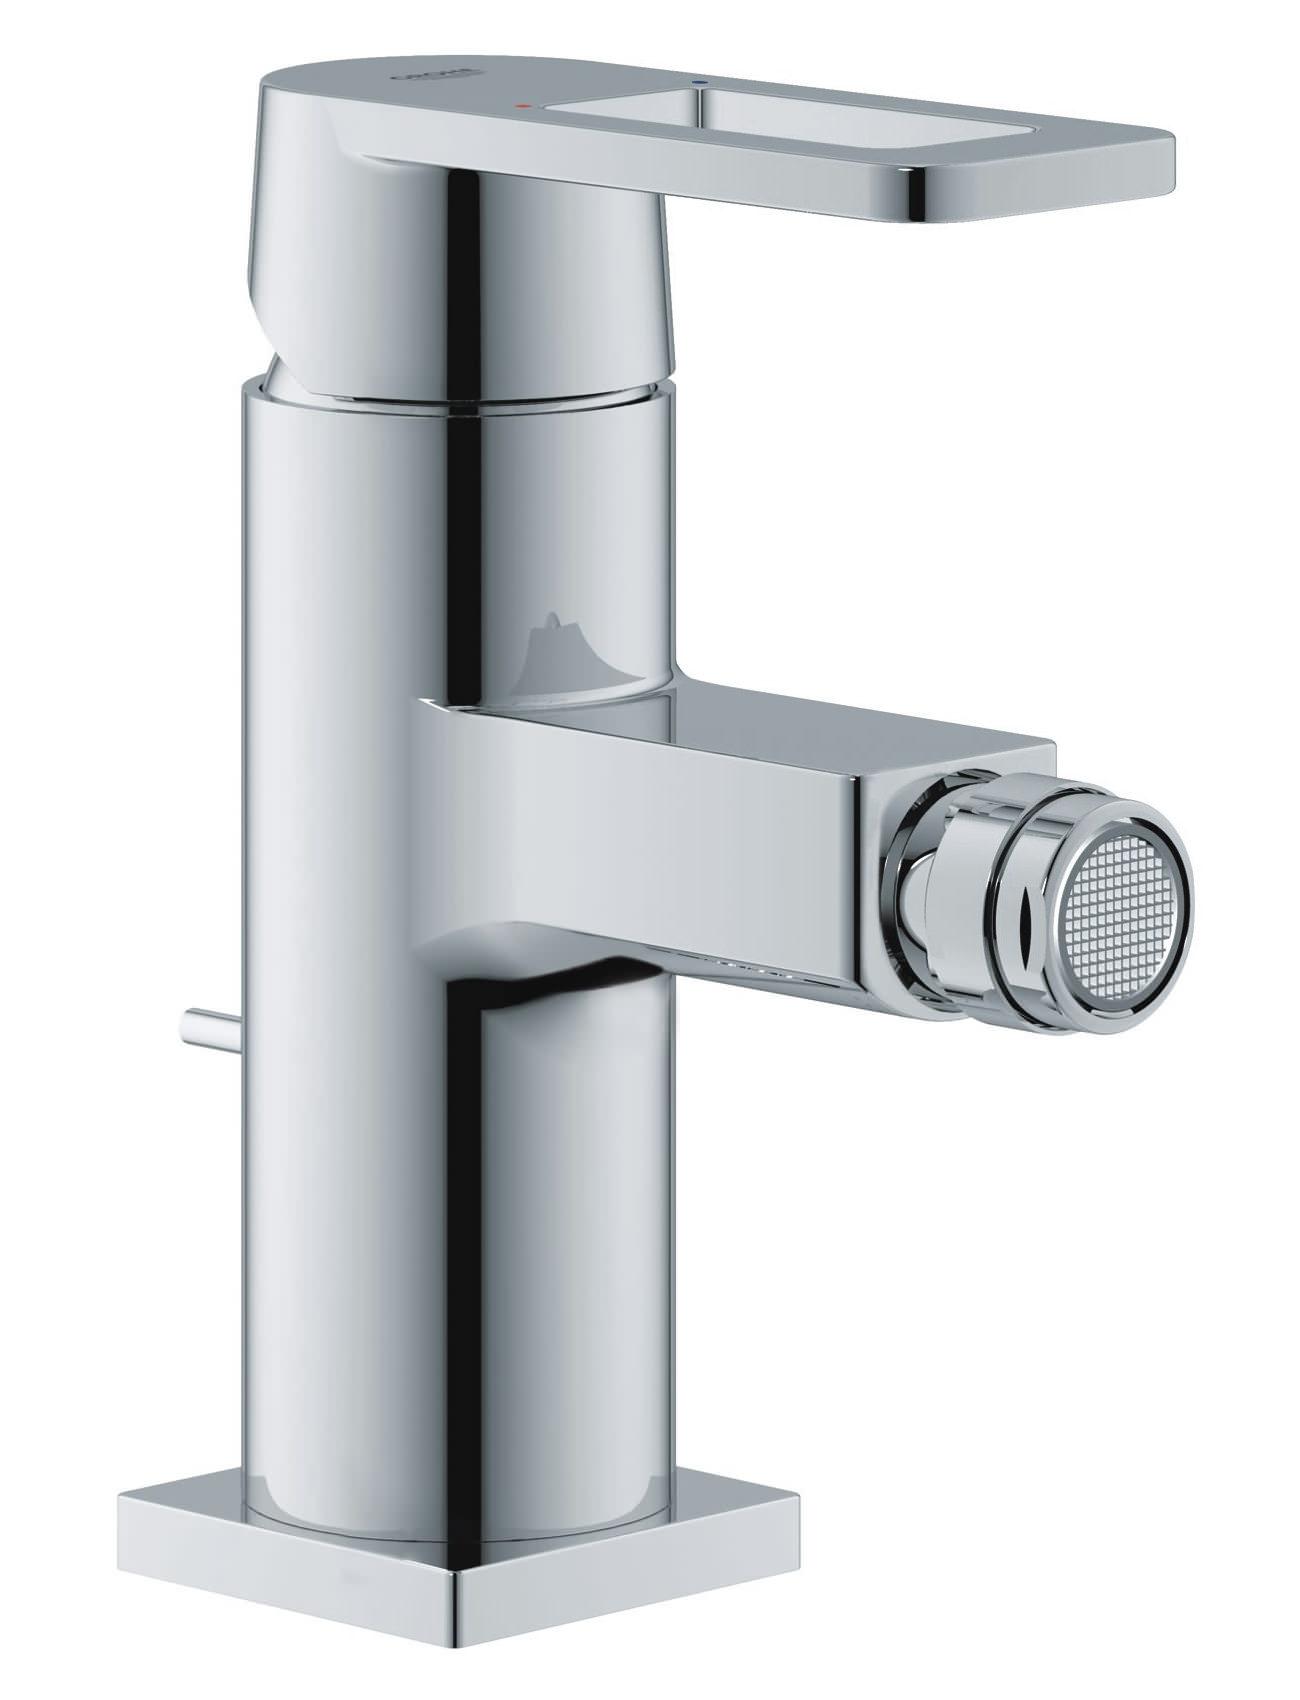 grohe quadra monobloc bidet mixer tap chrome 32636000. Black Bedroom Furniture Sets. Home Design Ideas